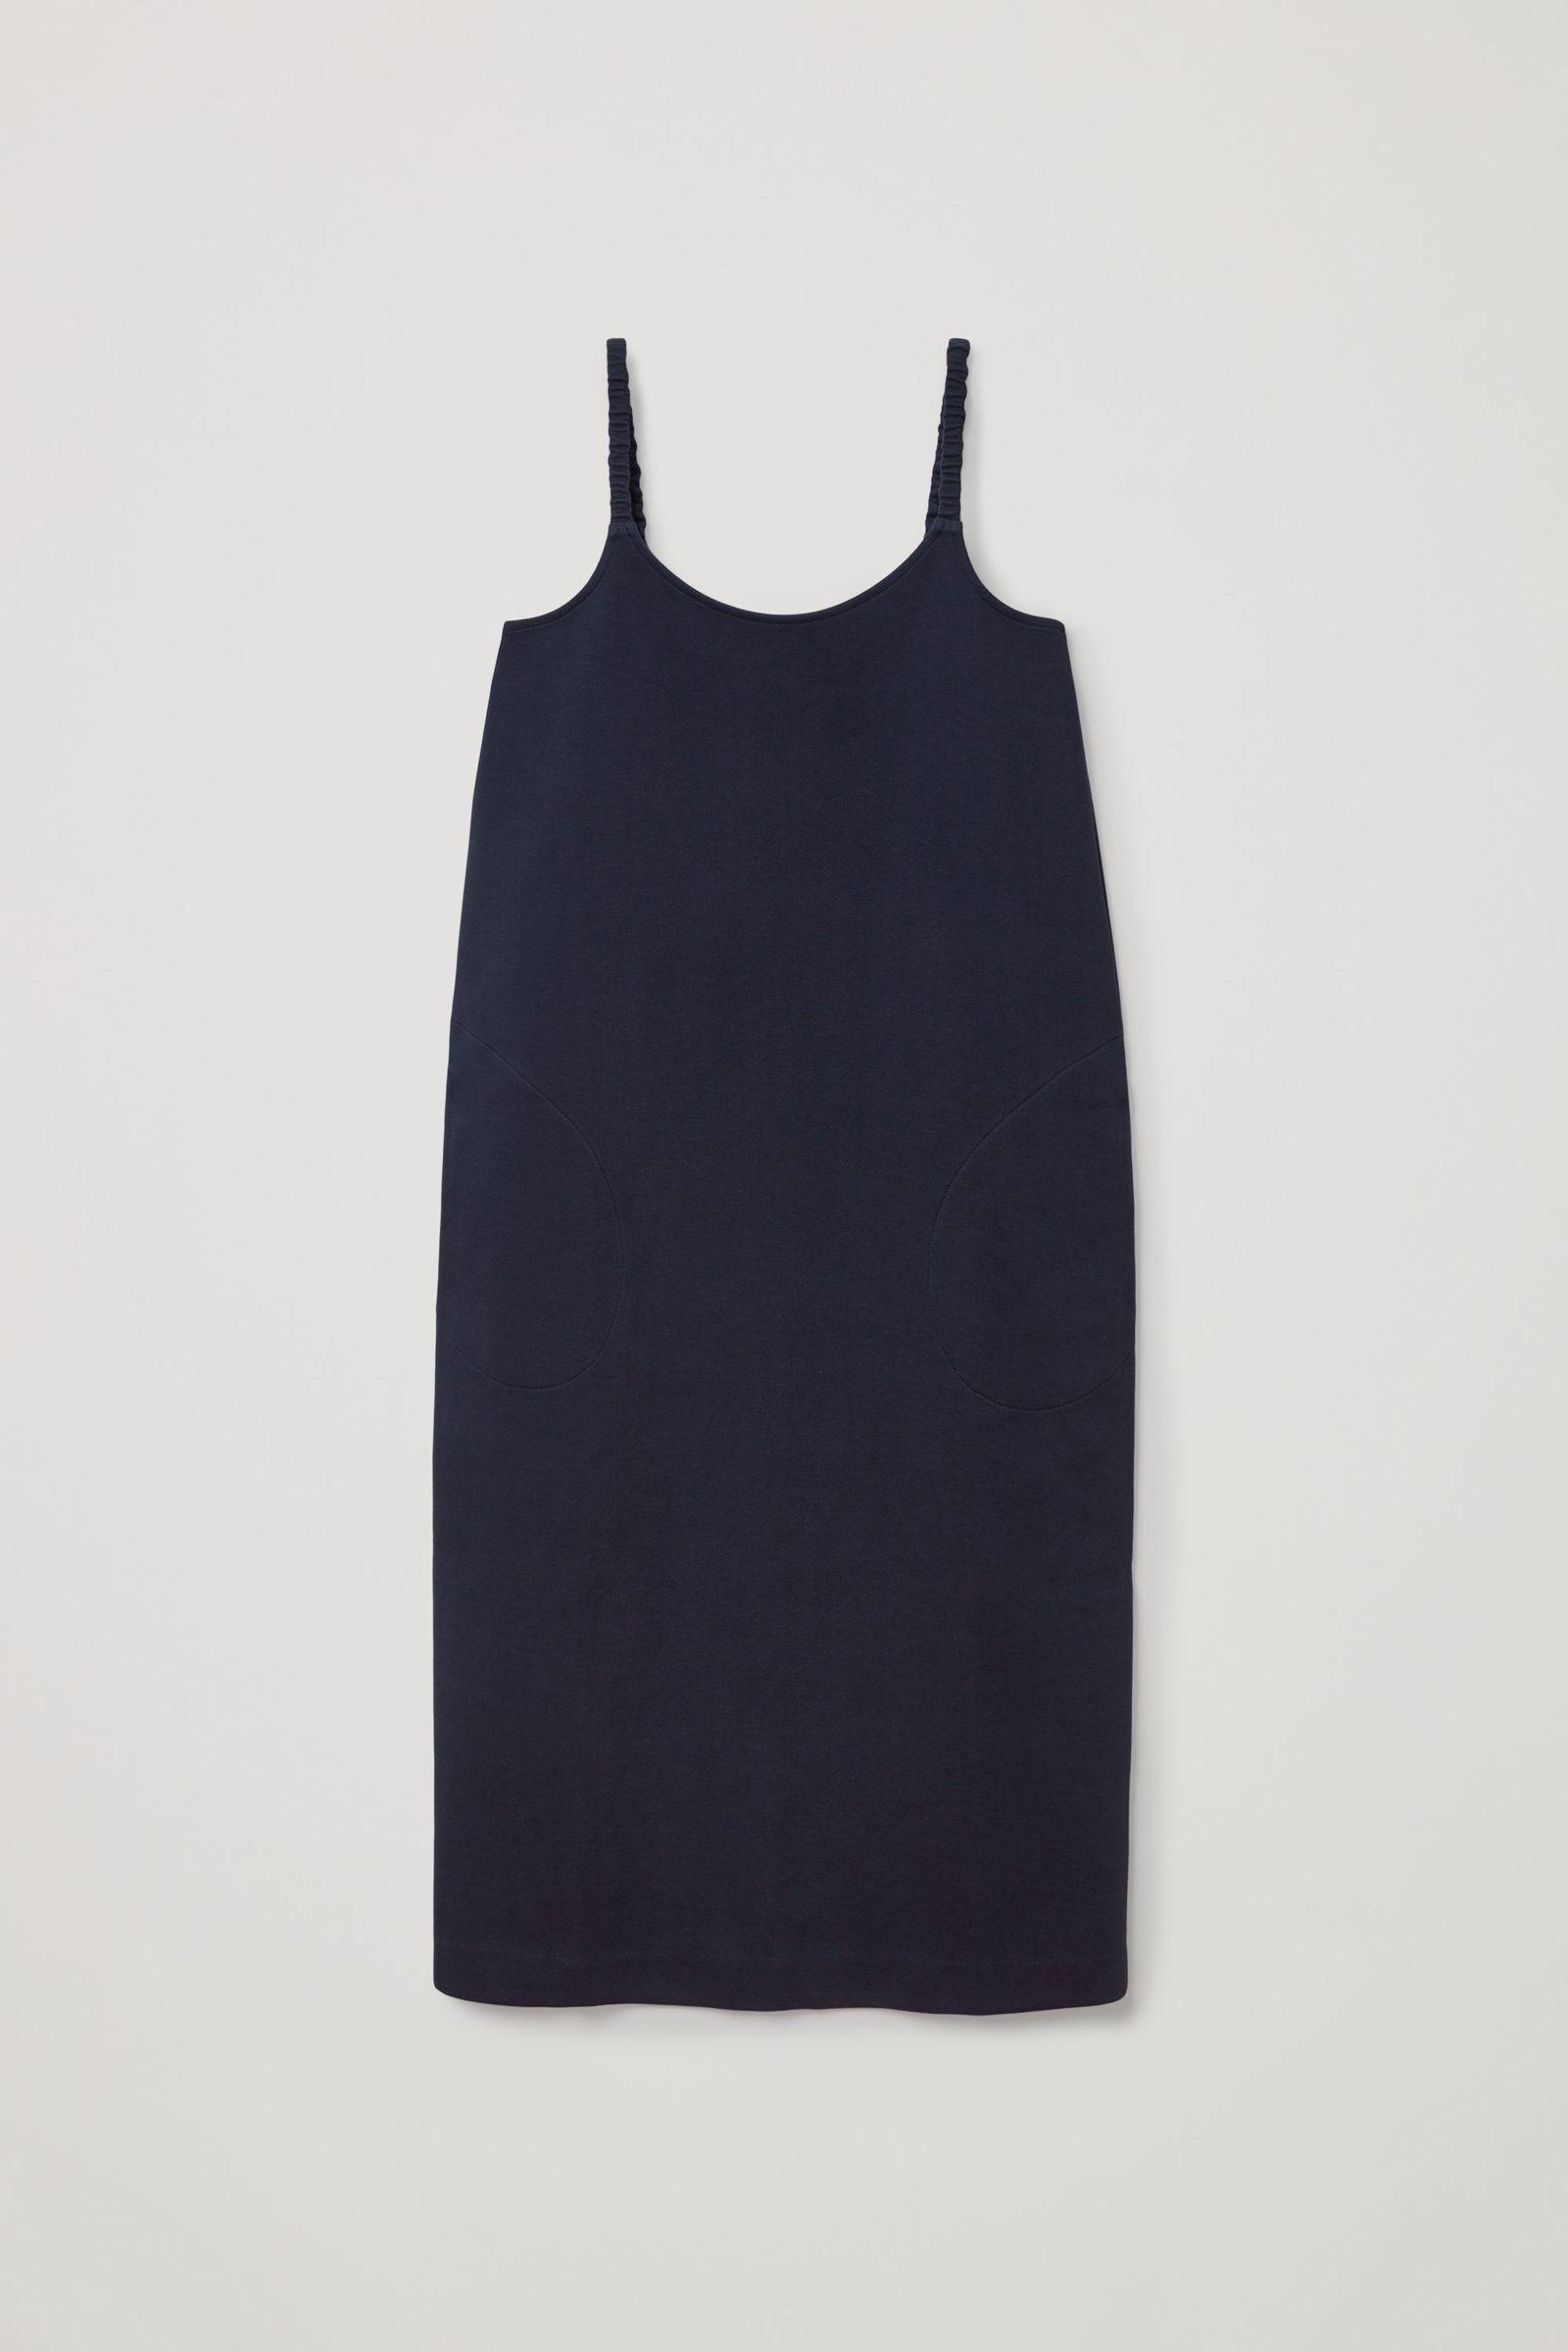 COS 오가닉 코튼 라운디드 헴 슬립 드레스의 네이비컬러 Product입니다.